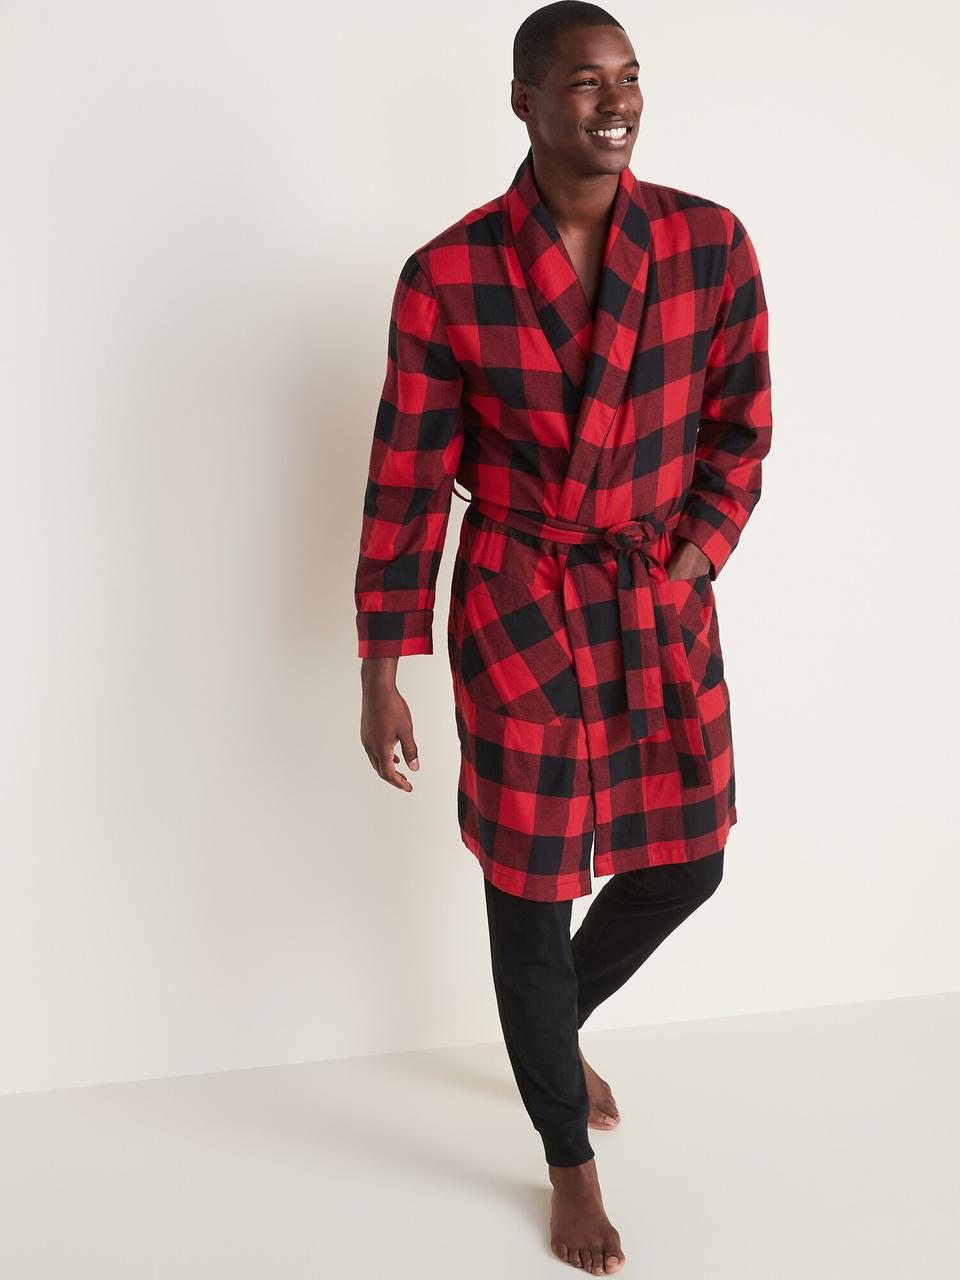 Мужской фланелевый домашний халат Old Navy халаты мужские для дома Олд Неви S/M